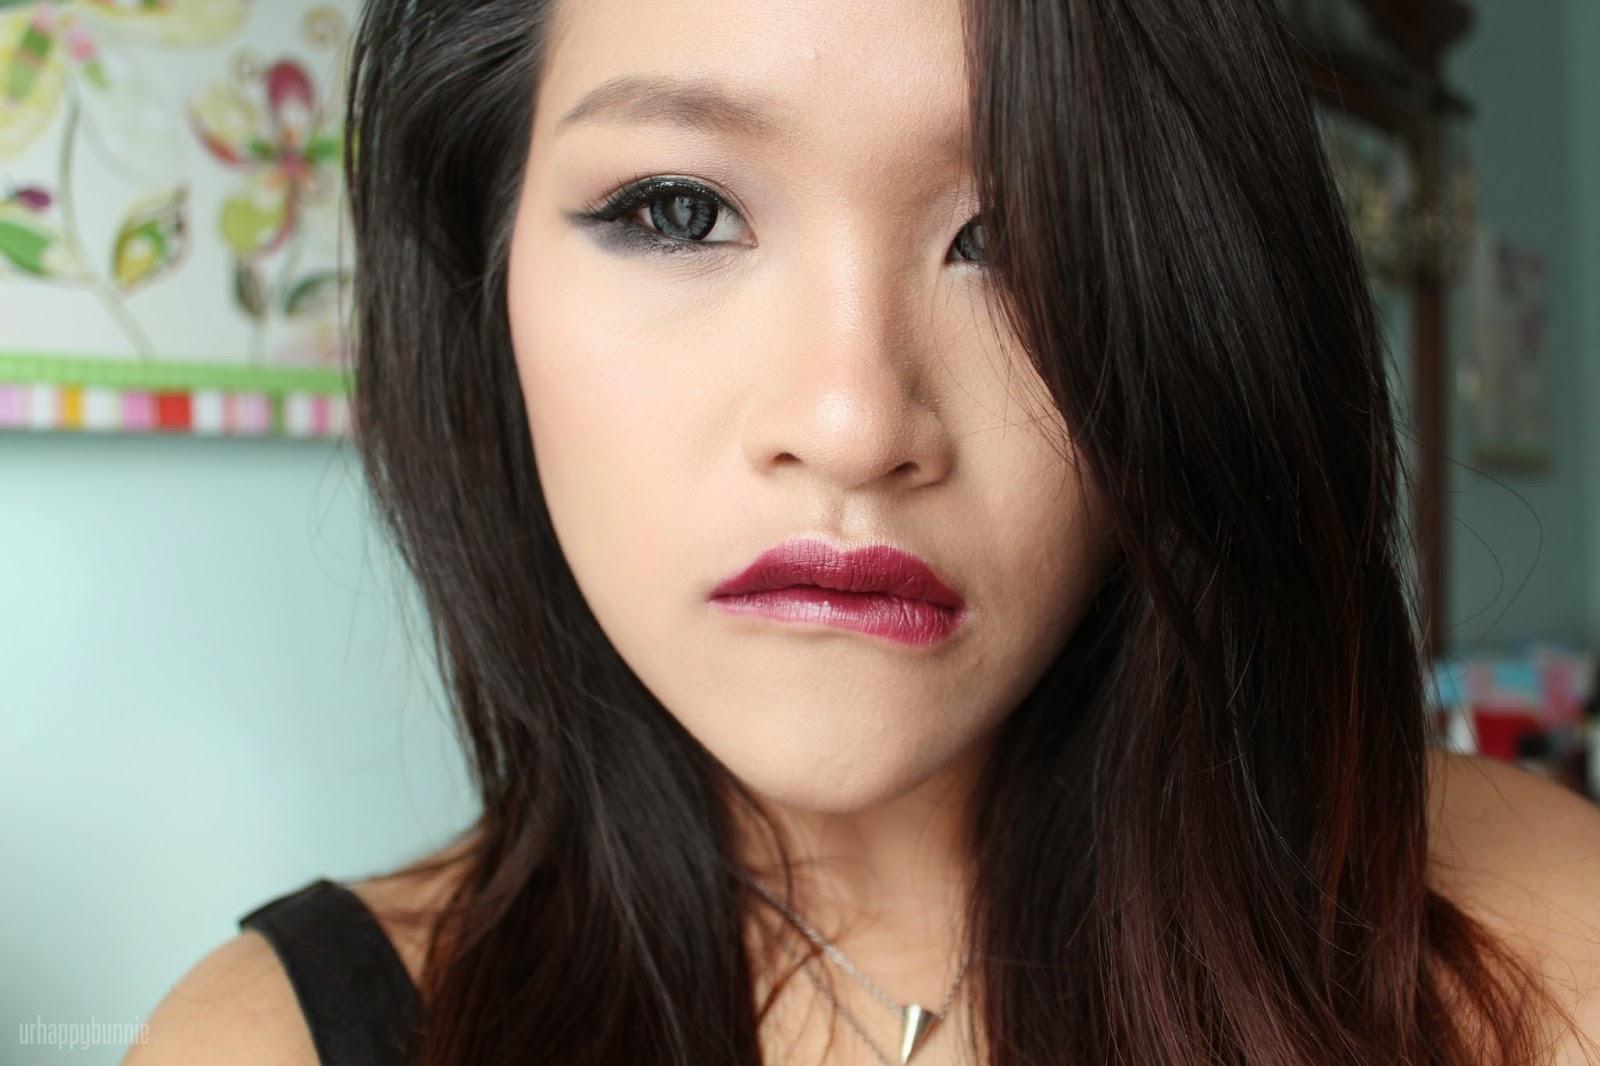 Urhappybunnie Kpops Bad Girls Lee Hyori Cl Hyuna Makeup Look